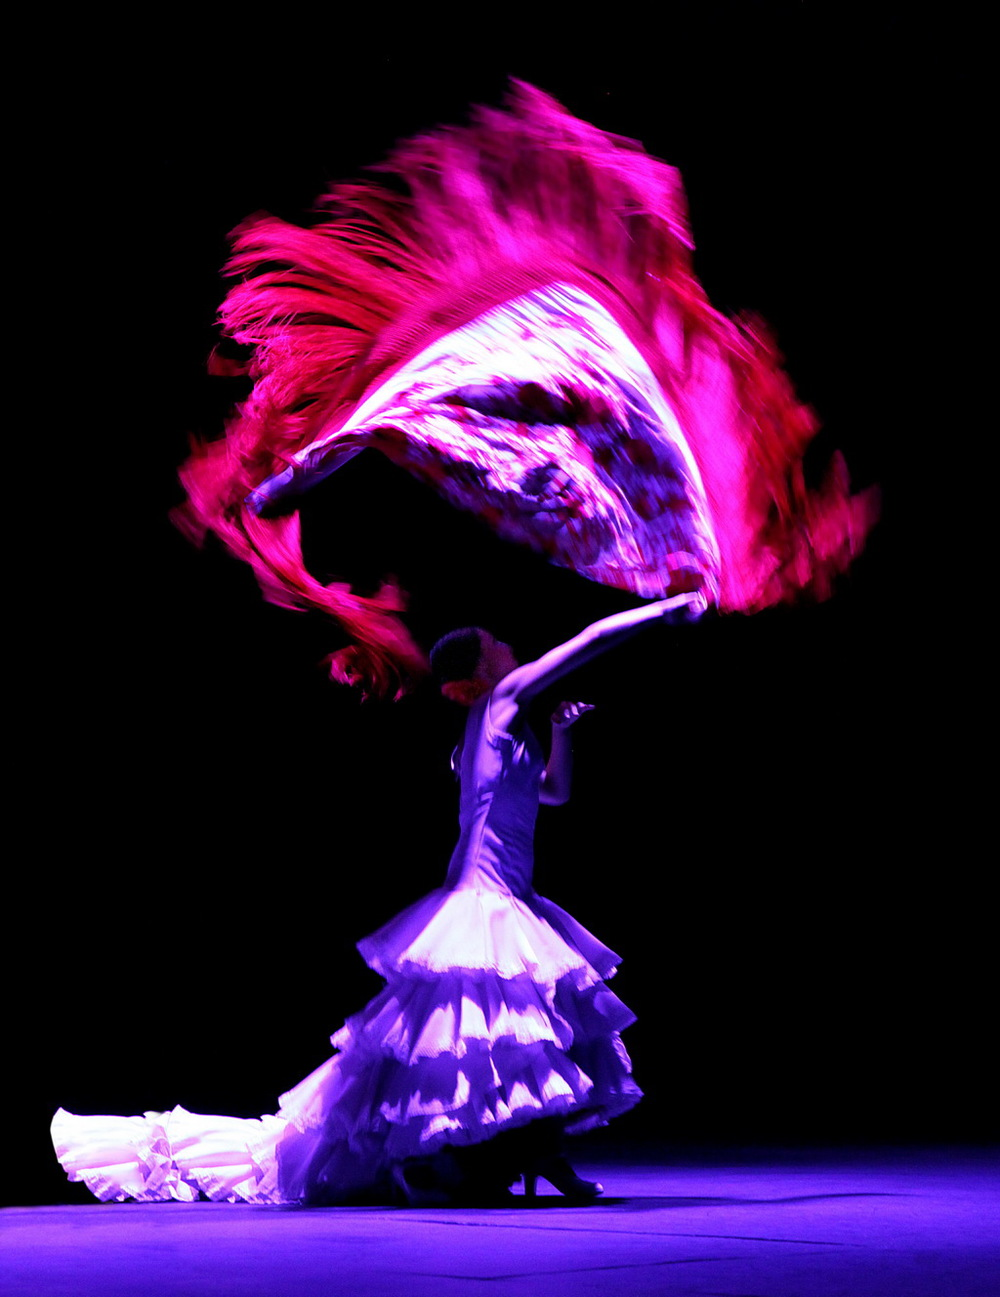 Flamenko I_resize.JPG